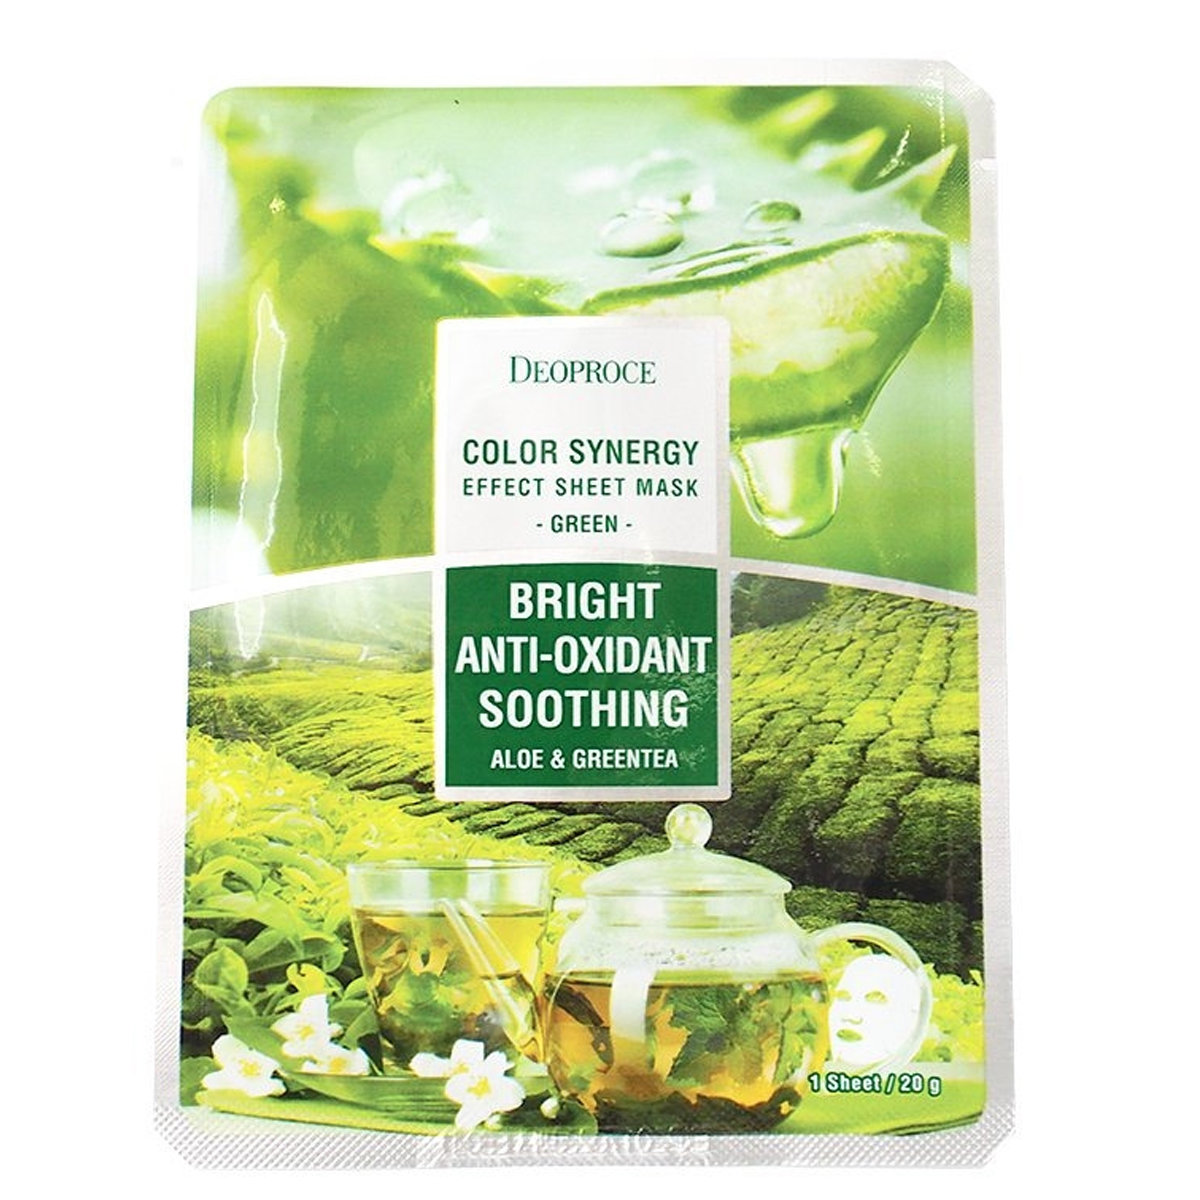 Тканевая маска на основе экстрактов алое и зеленого чая Deoproce color synergy effect sheet mask Green 20г